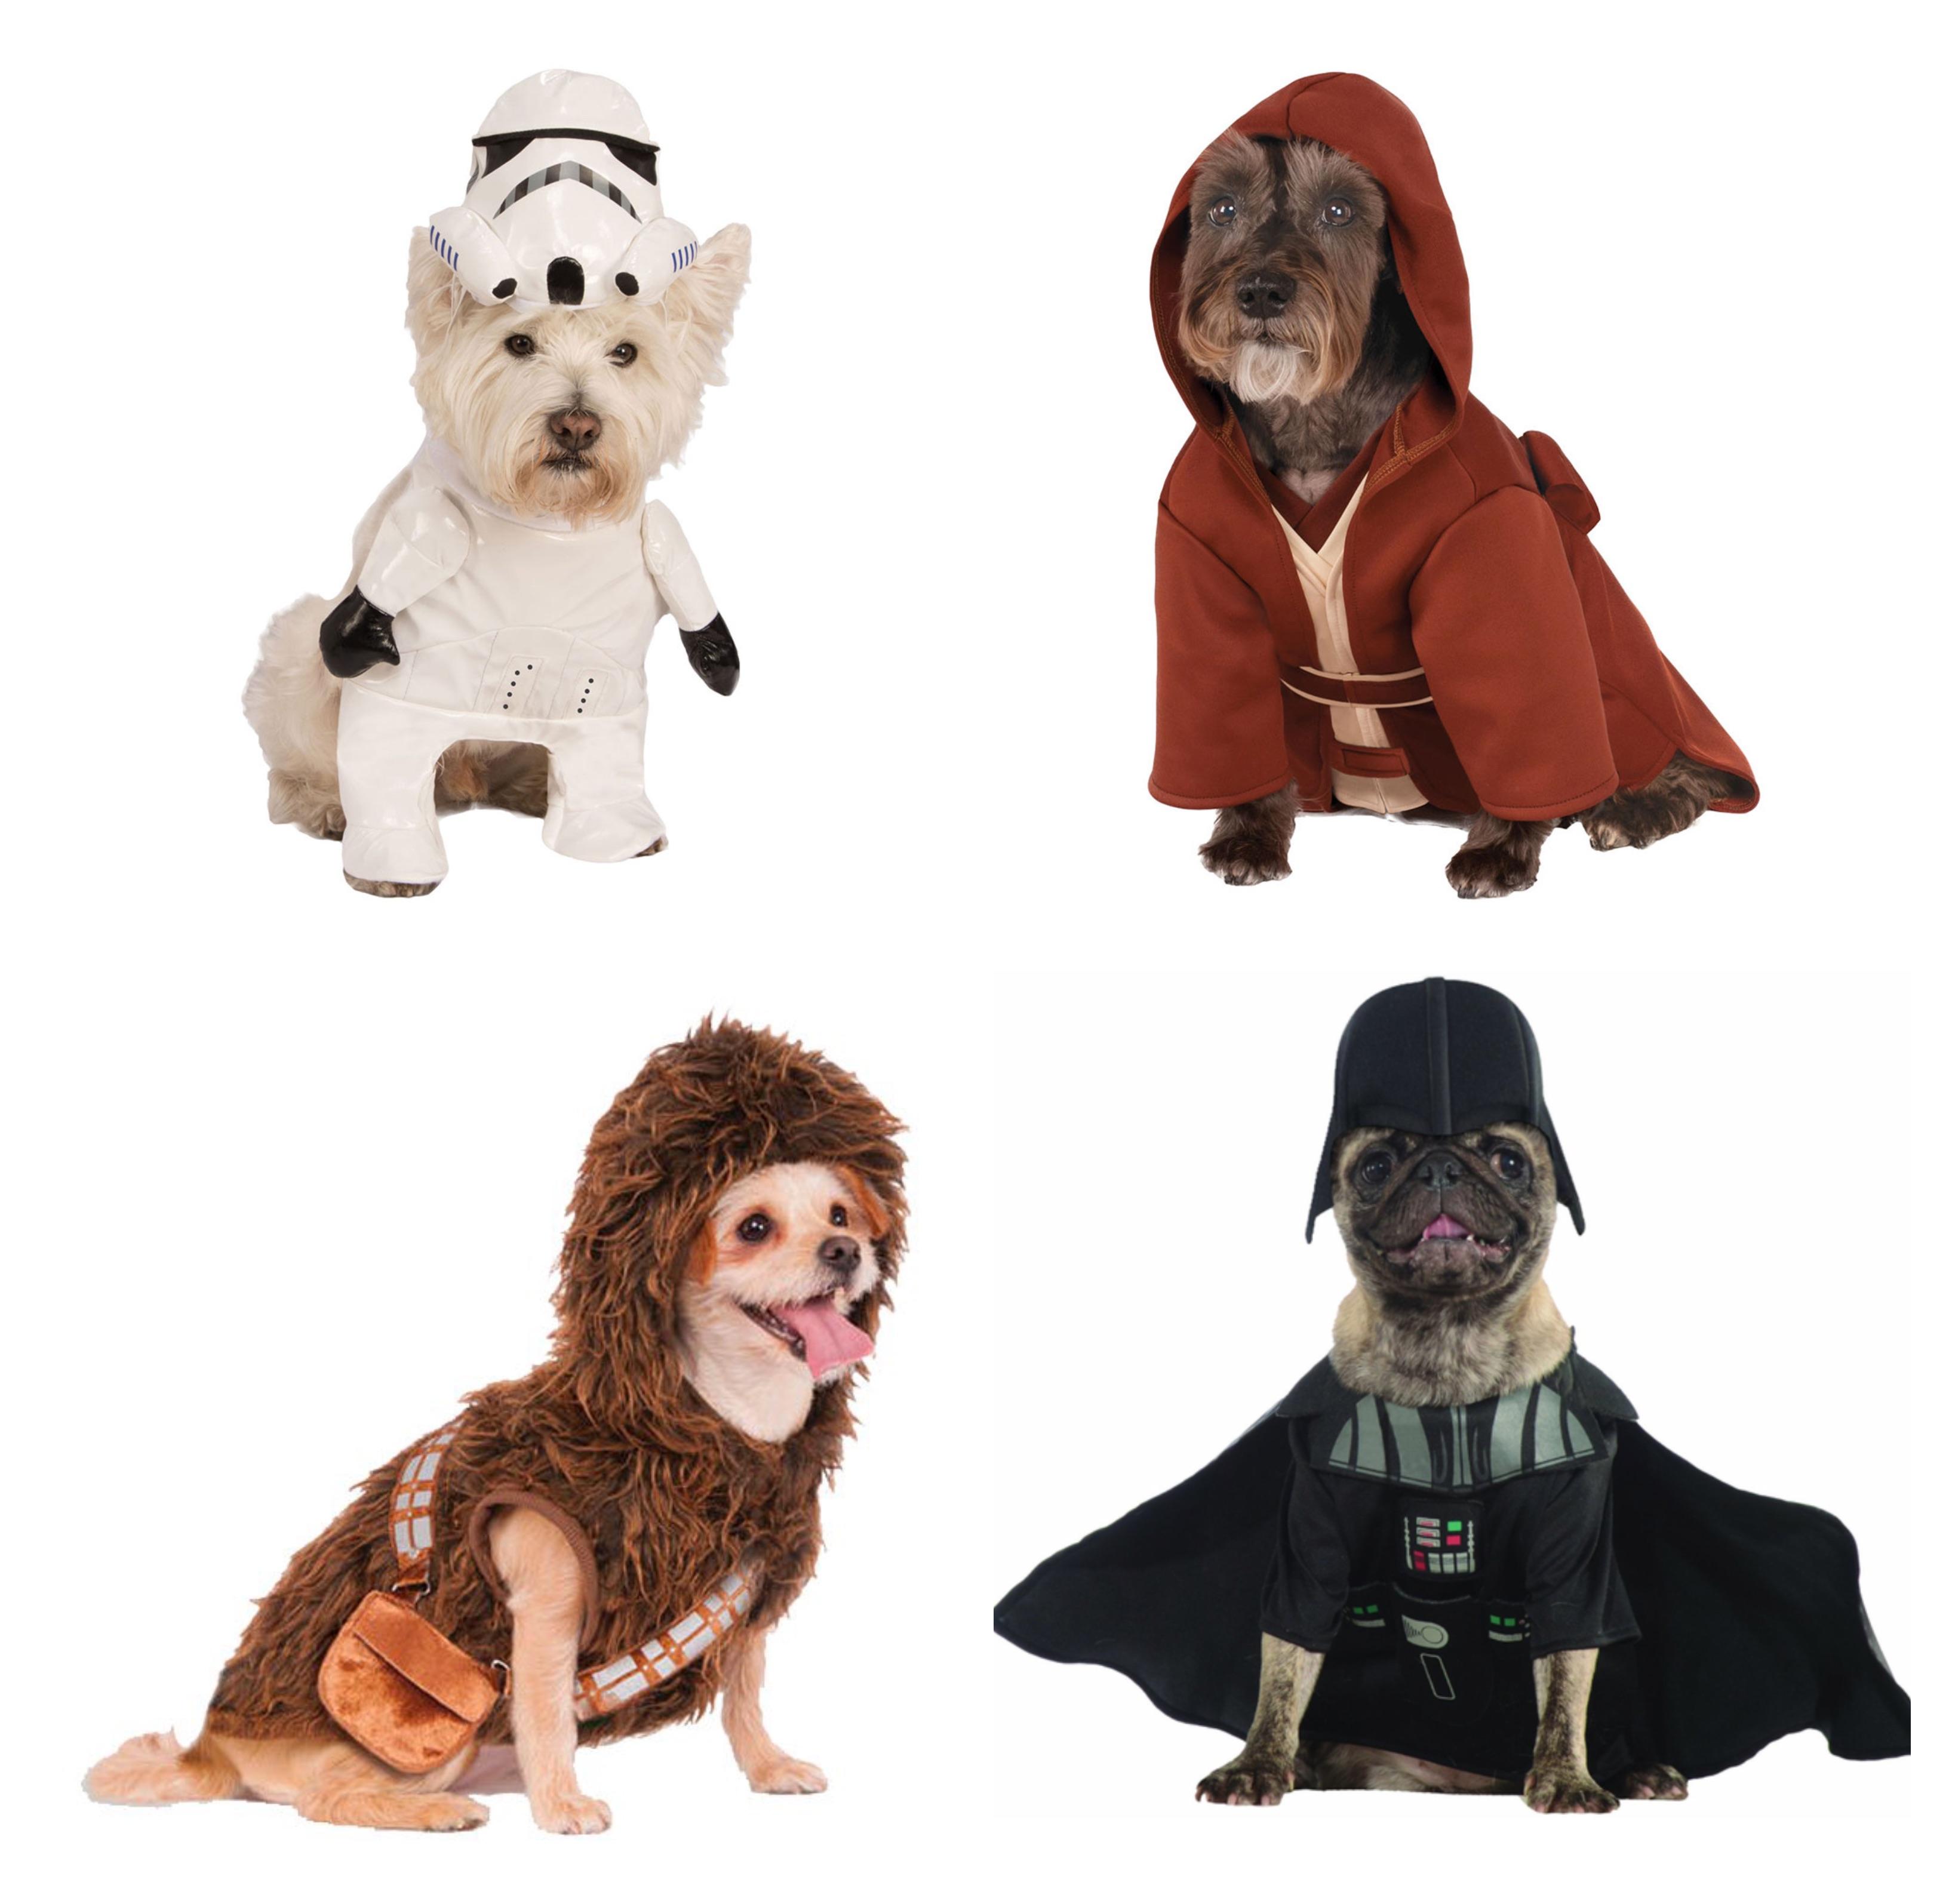 star wars hunde kostume - Star Wars hunde kostume